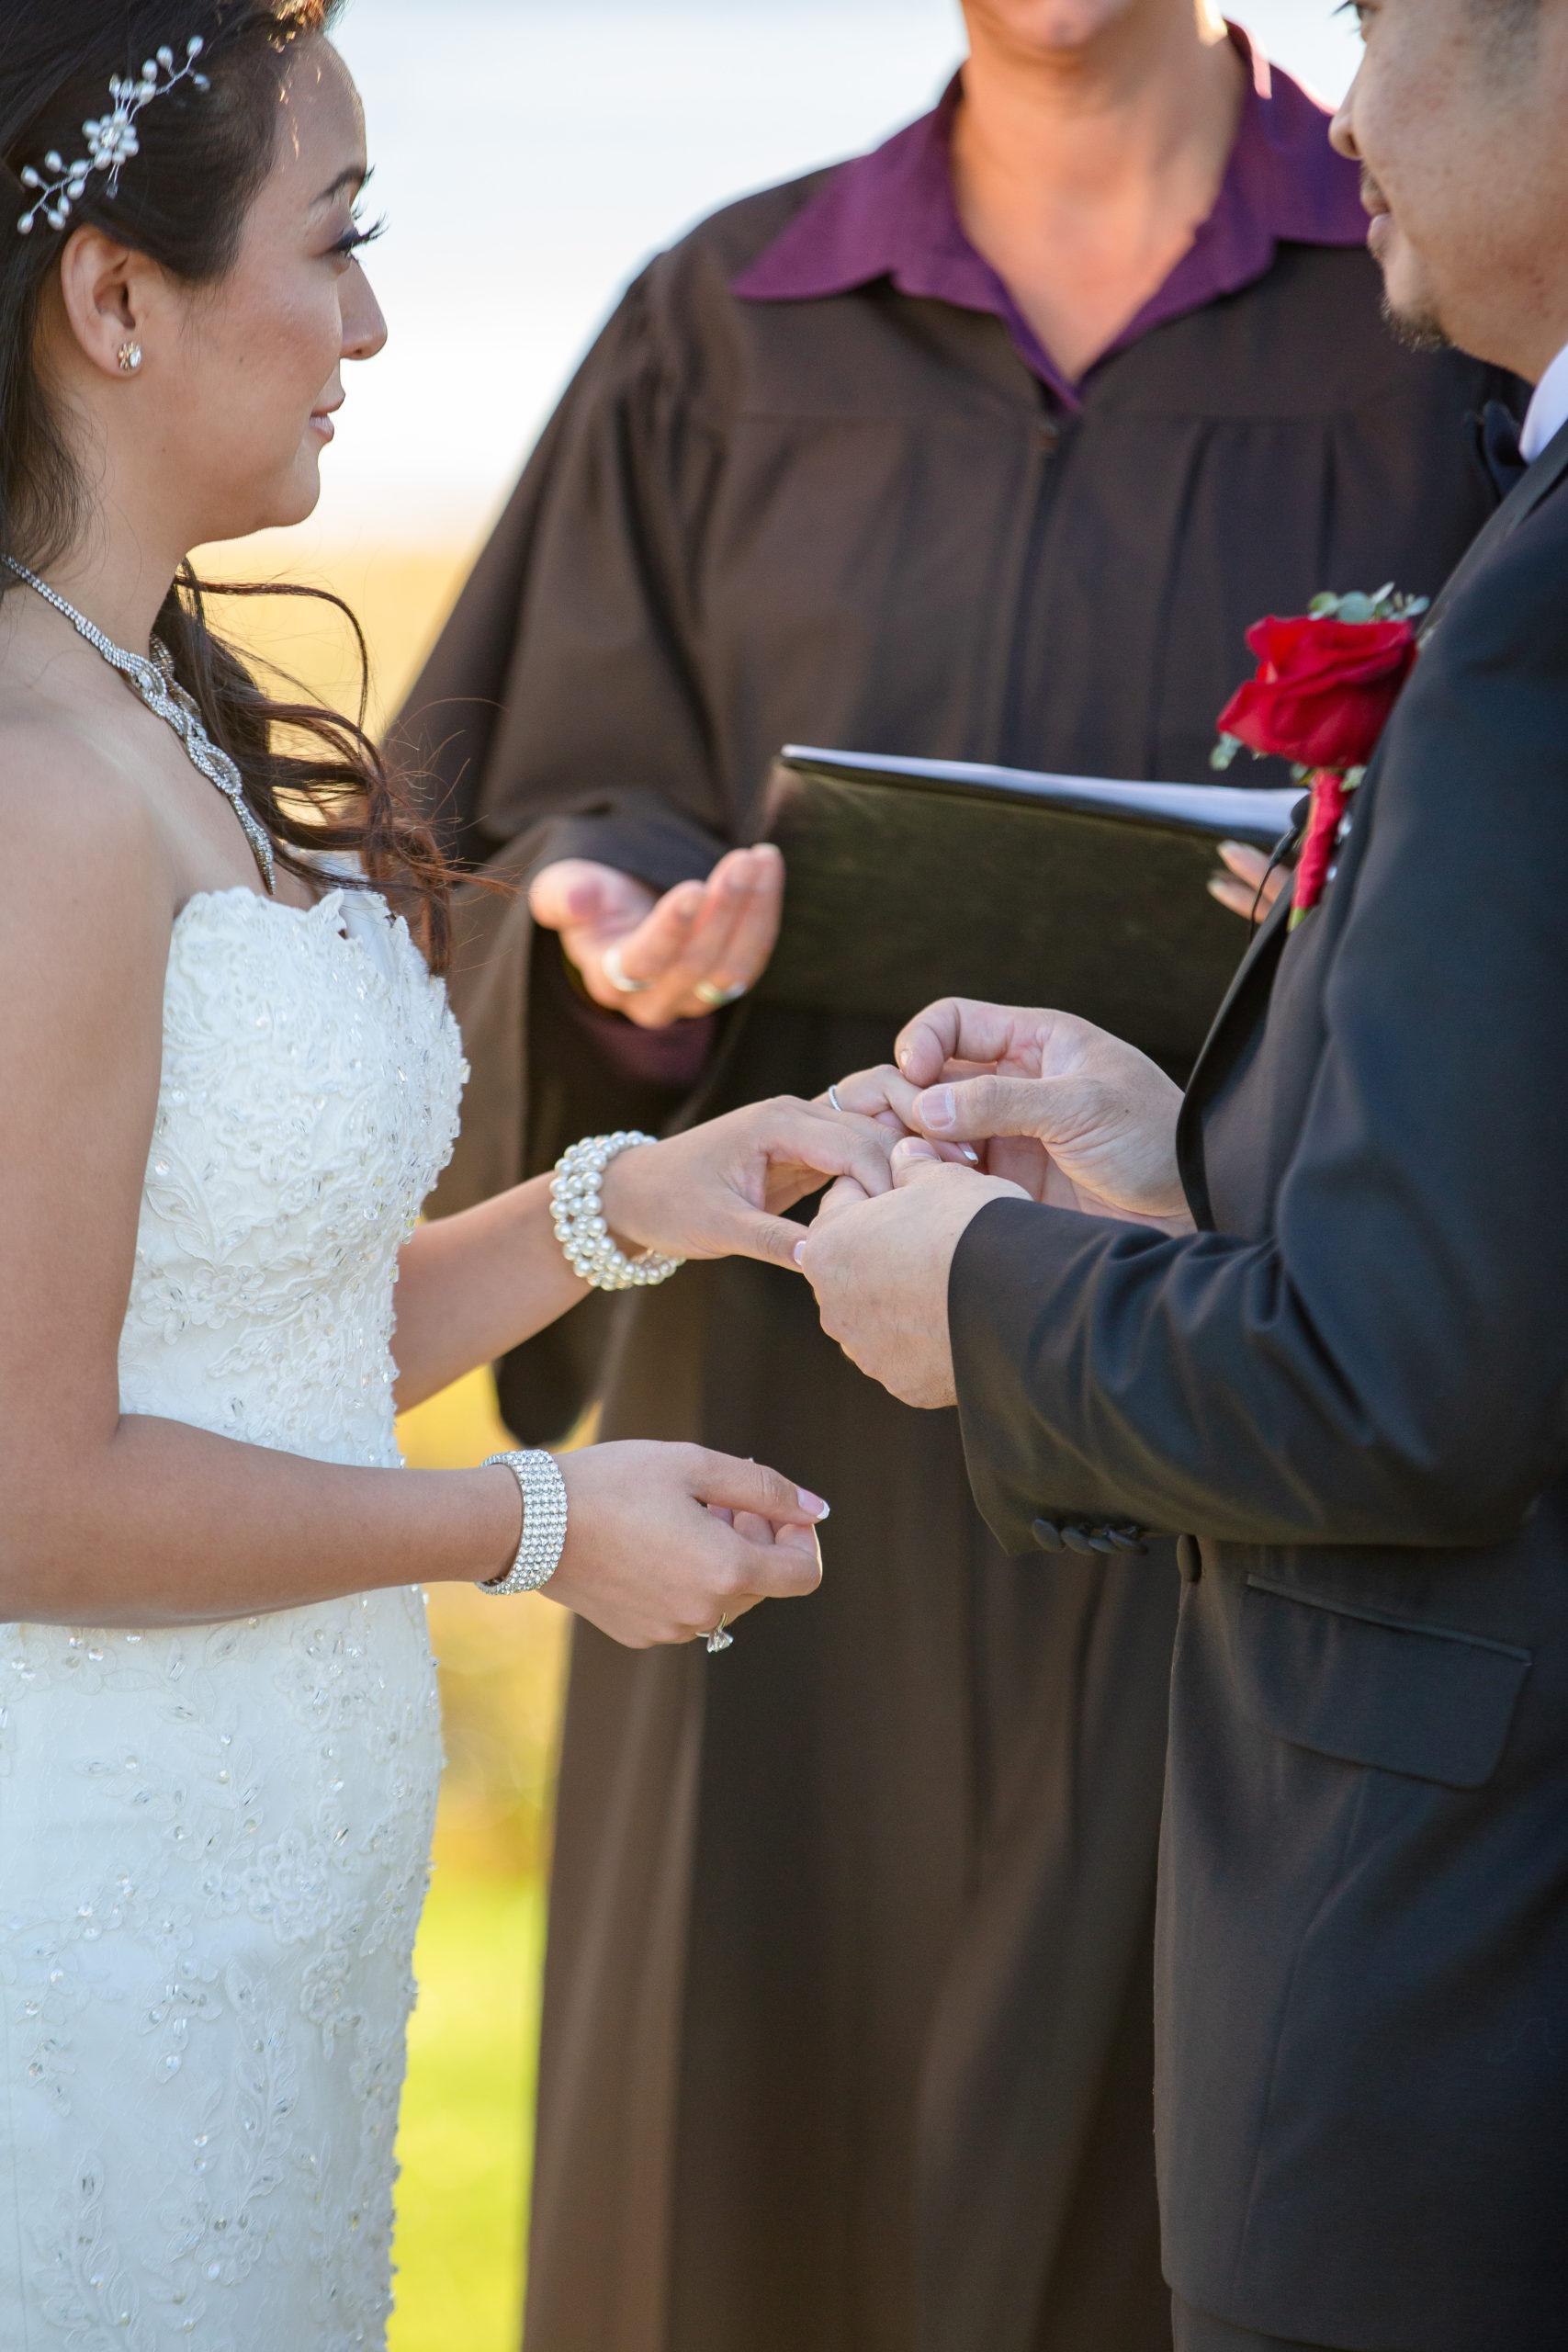 Harbor lights, warwick, rhode island, RI, Tracy Jenkins Photography, RI wedding photographer, Rhode Island wedding photographer, micro-wedding, wedding ceremony, ring exchange